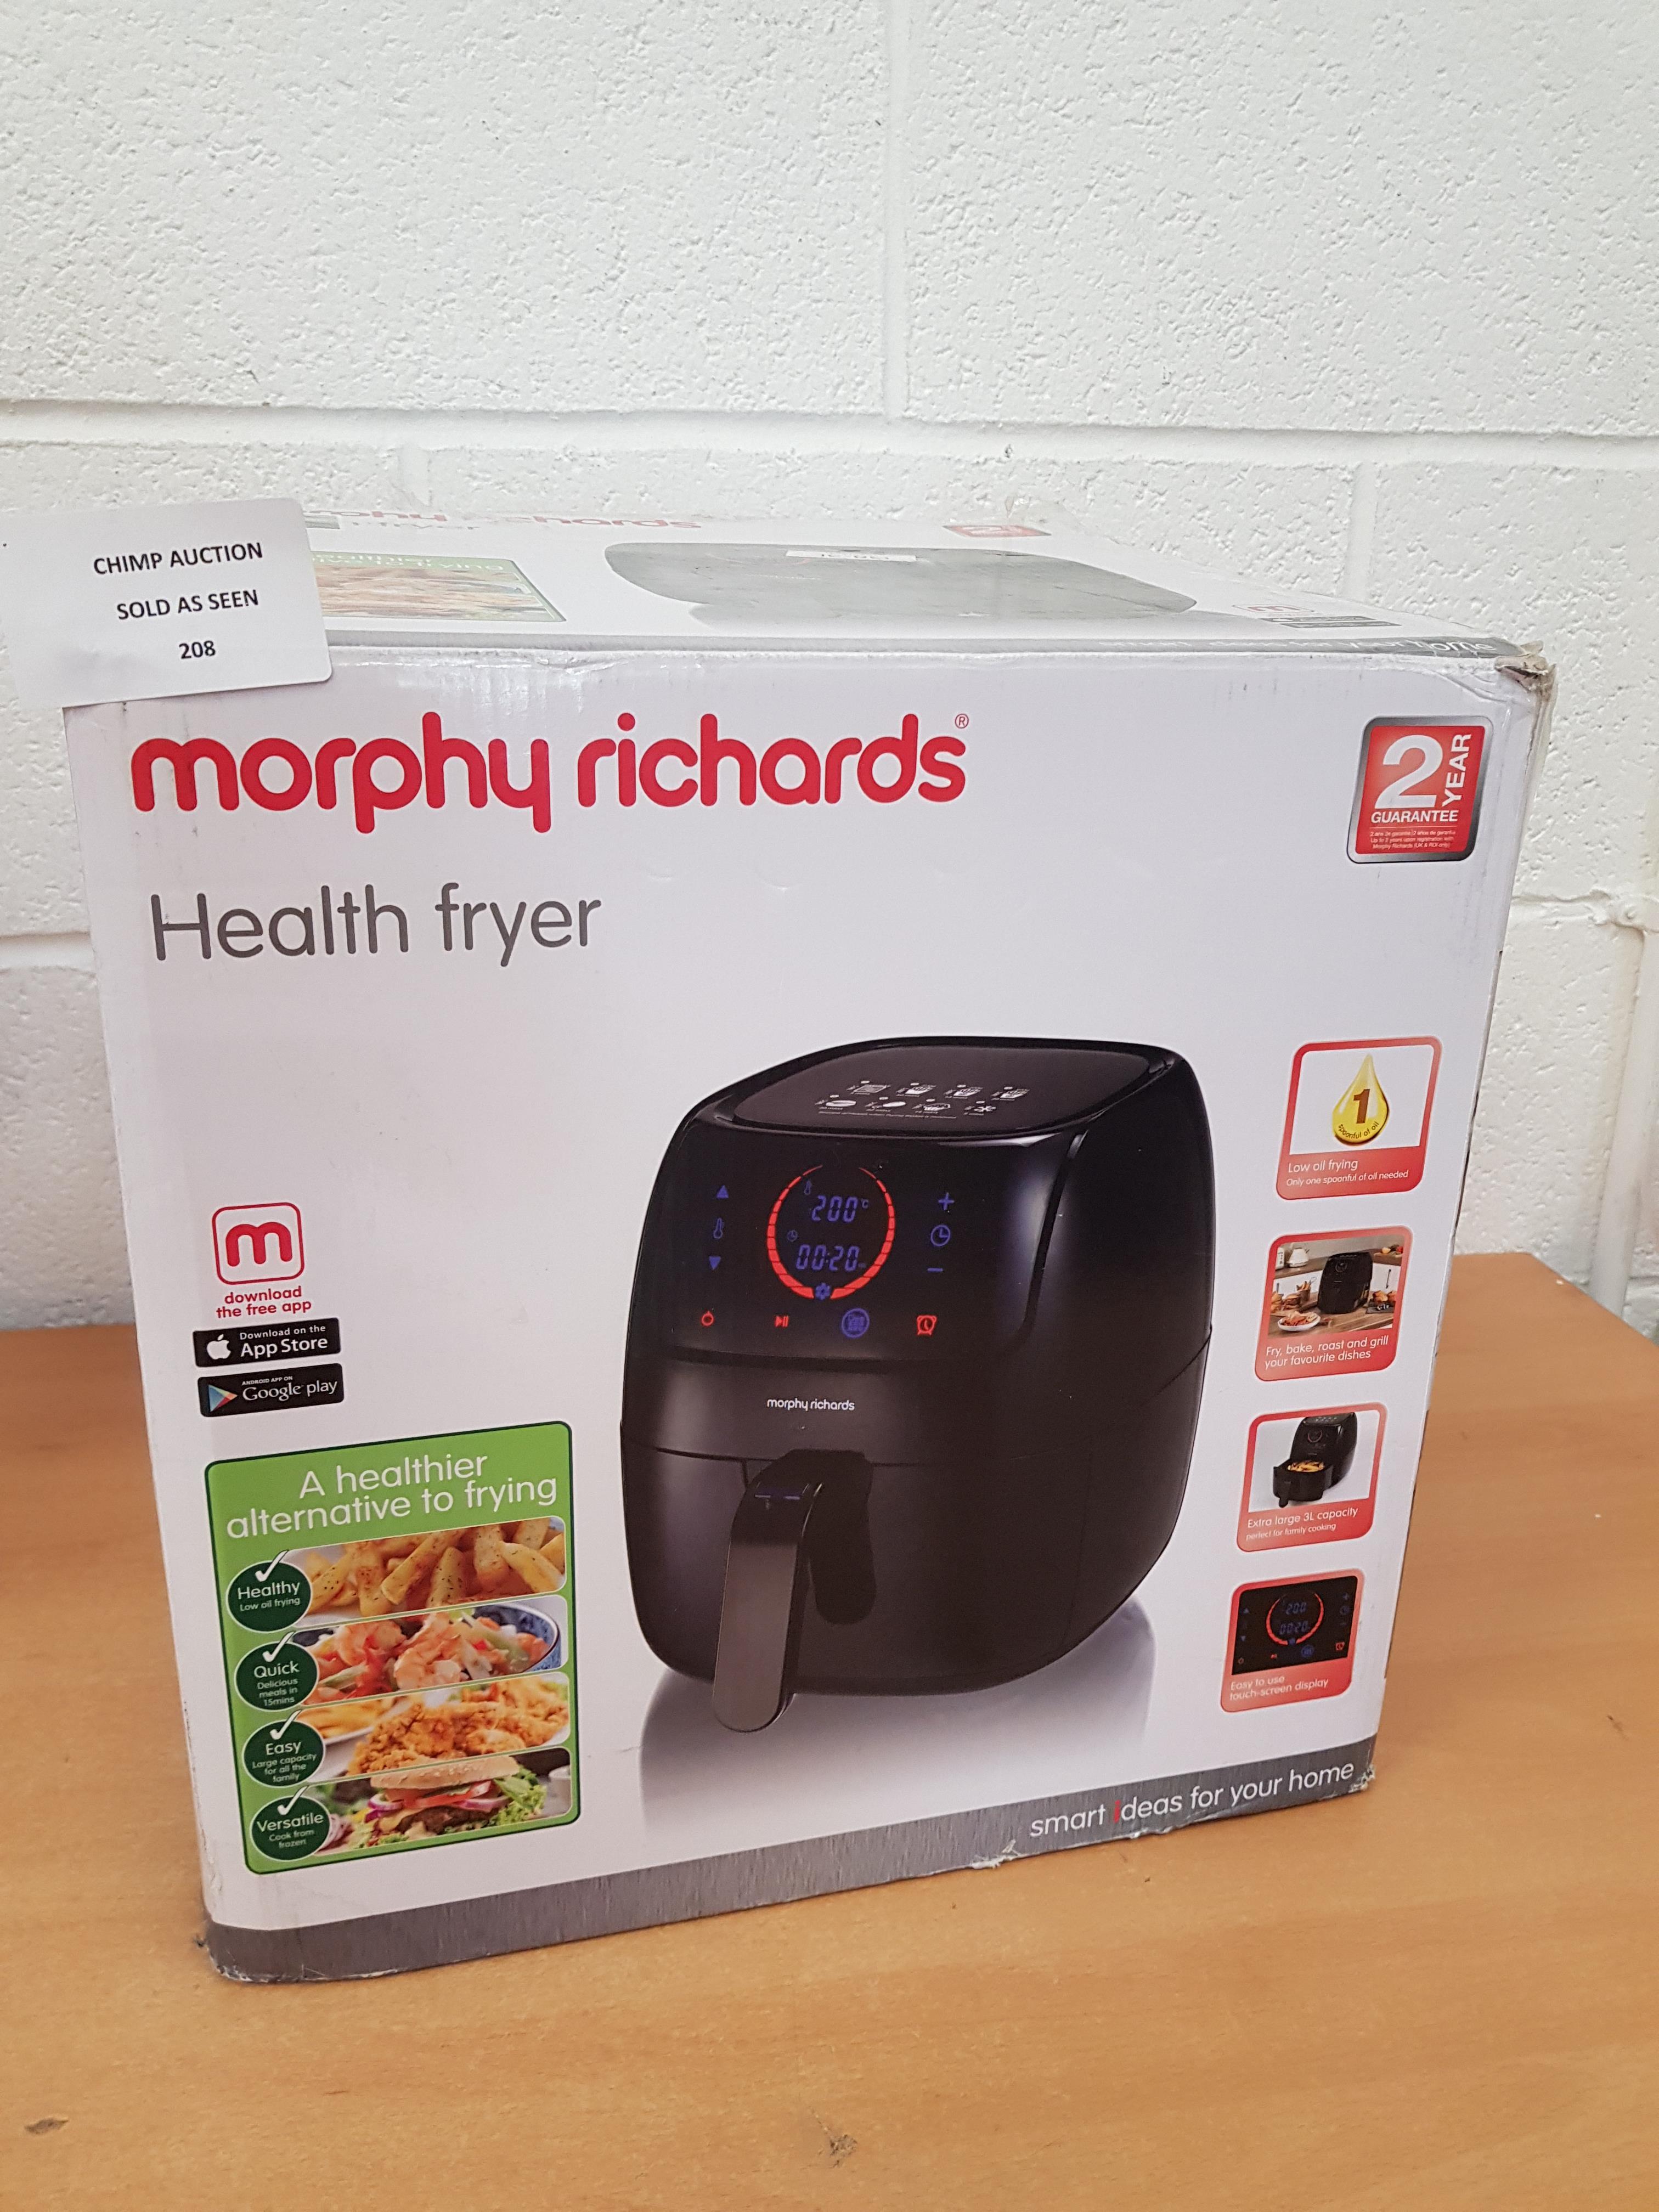 Lot 208 - Morphy Richards 3L 480001 Health Fryer RRP £119.99